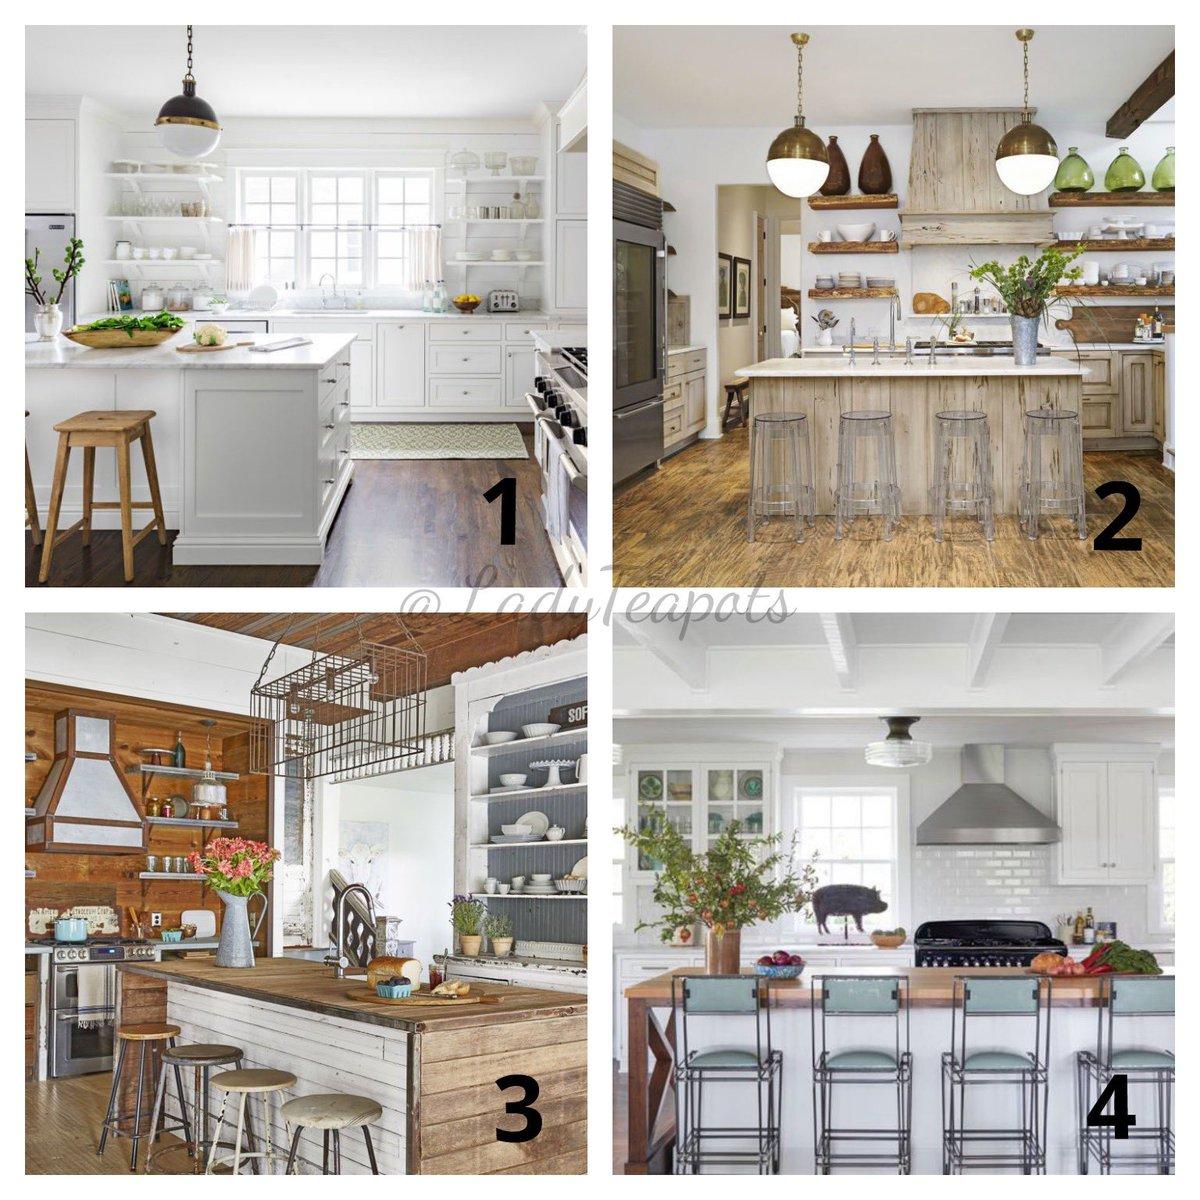 Which farmhouse kitchen do you prefer? 🍃🍒🍃🍒🍃🍒🍃🍒🍃🍒🍃 #QuestionOfTheDay #kitchendecor #kitchendesign #kitchens #farmhouses